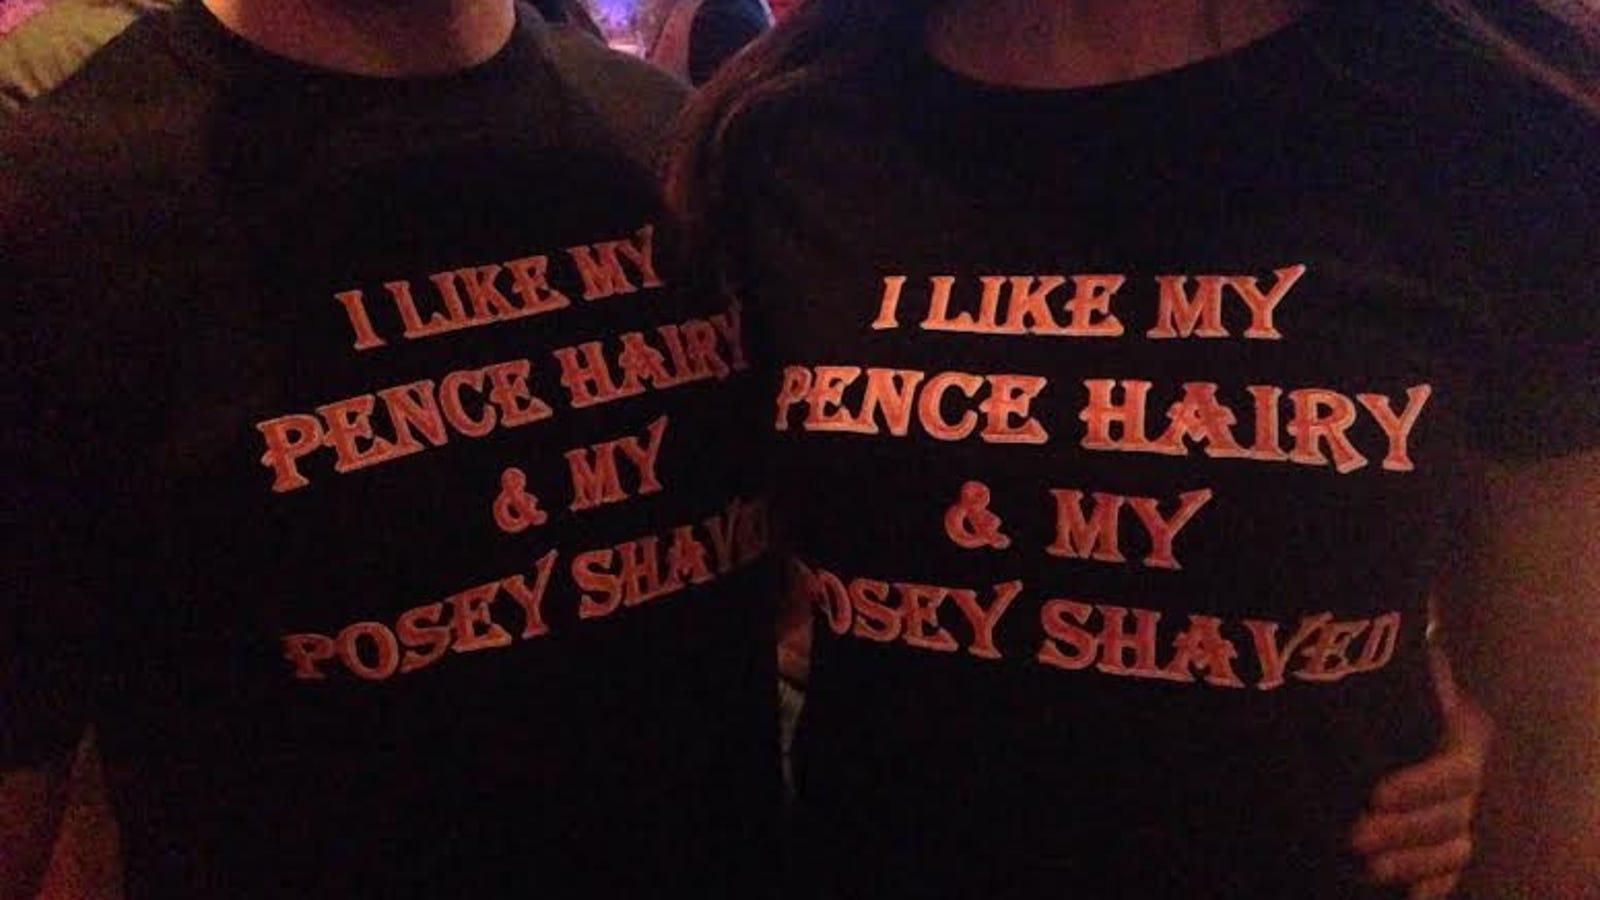 Giants fan custom makes bawdy t shirts for T shirt printing brandon fl